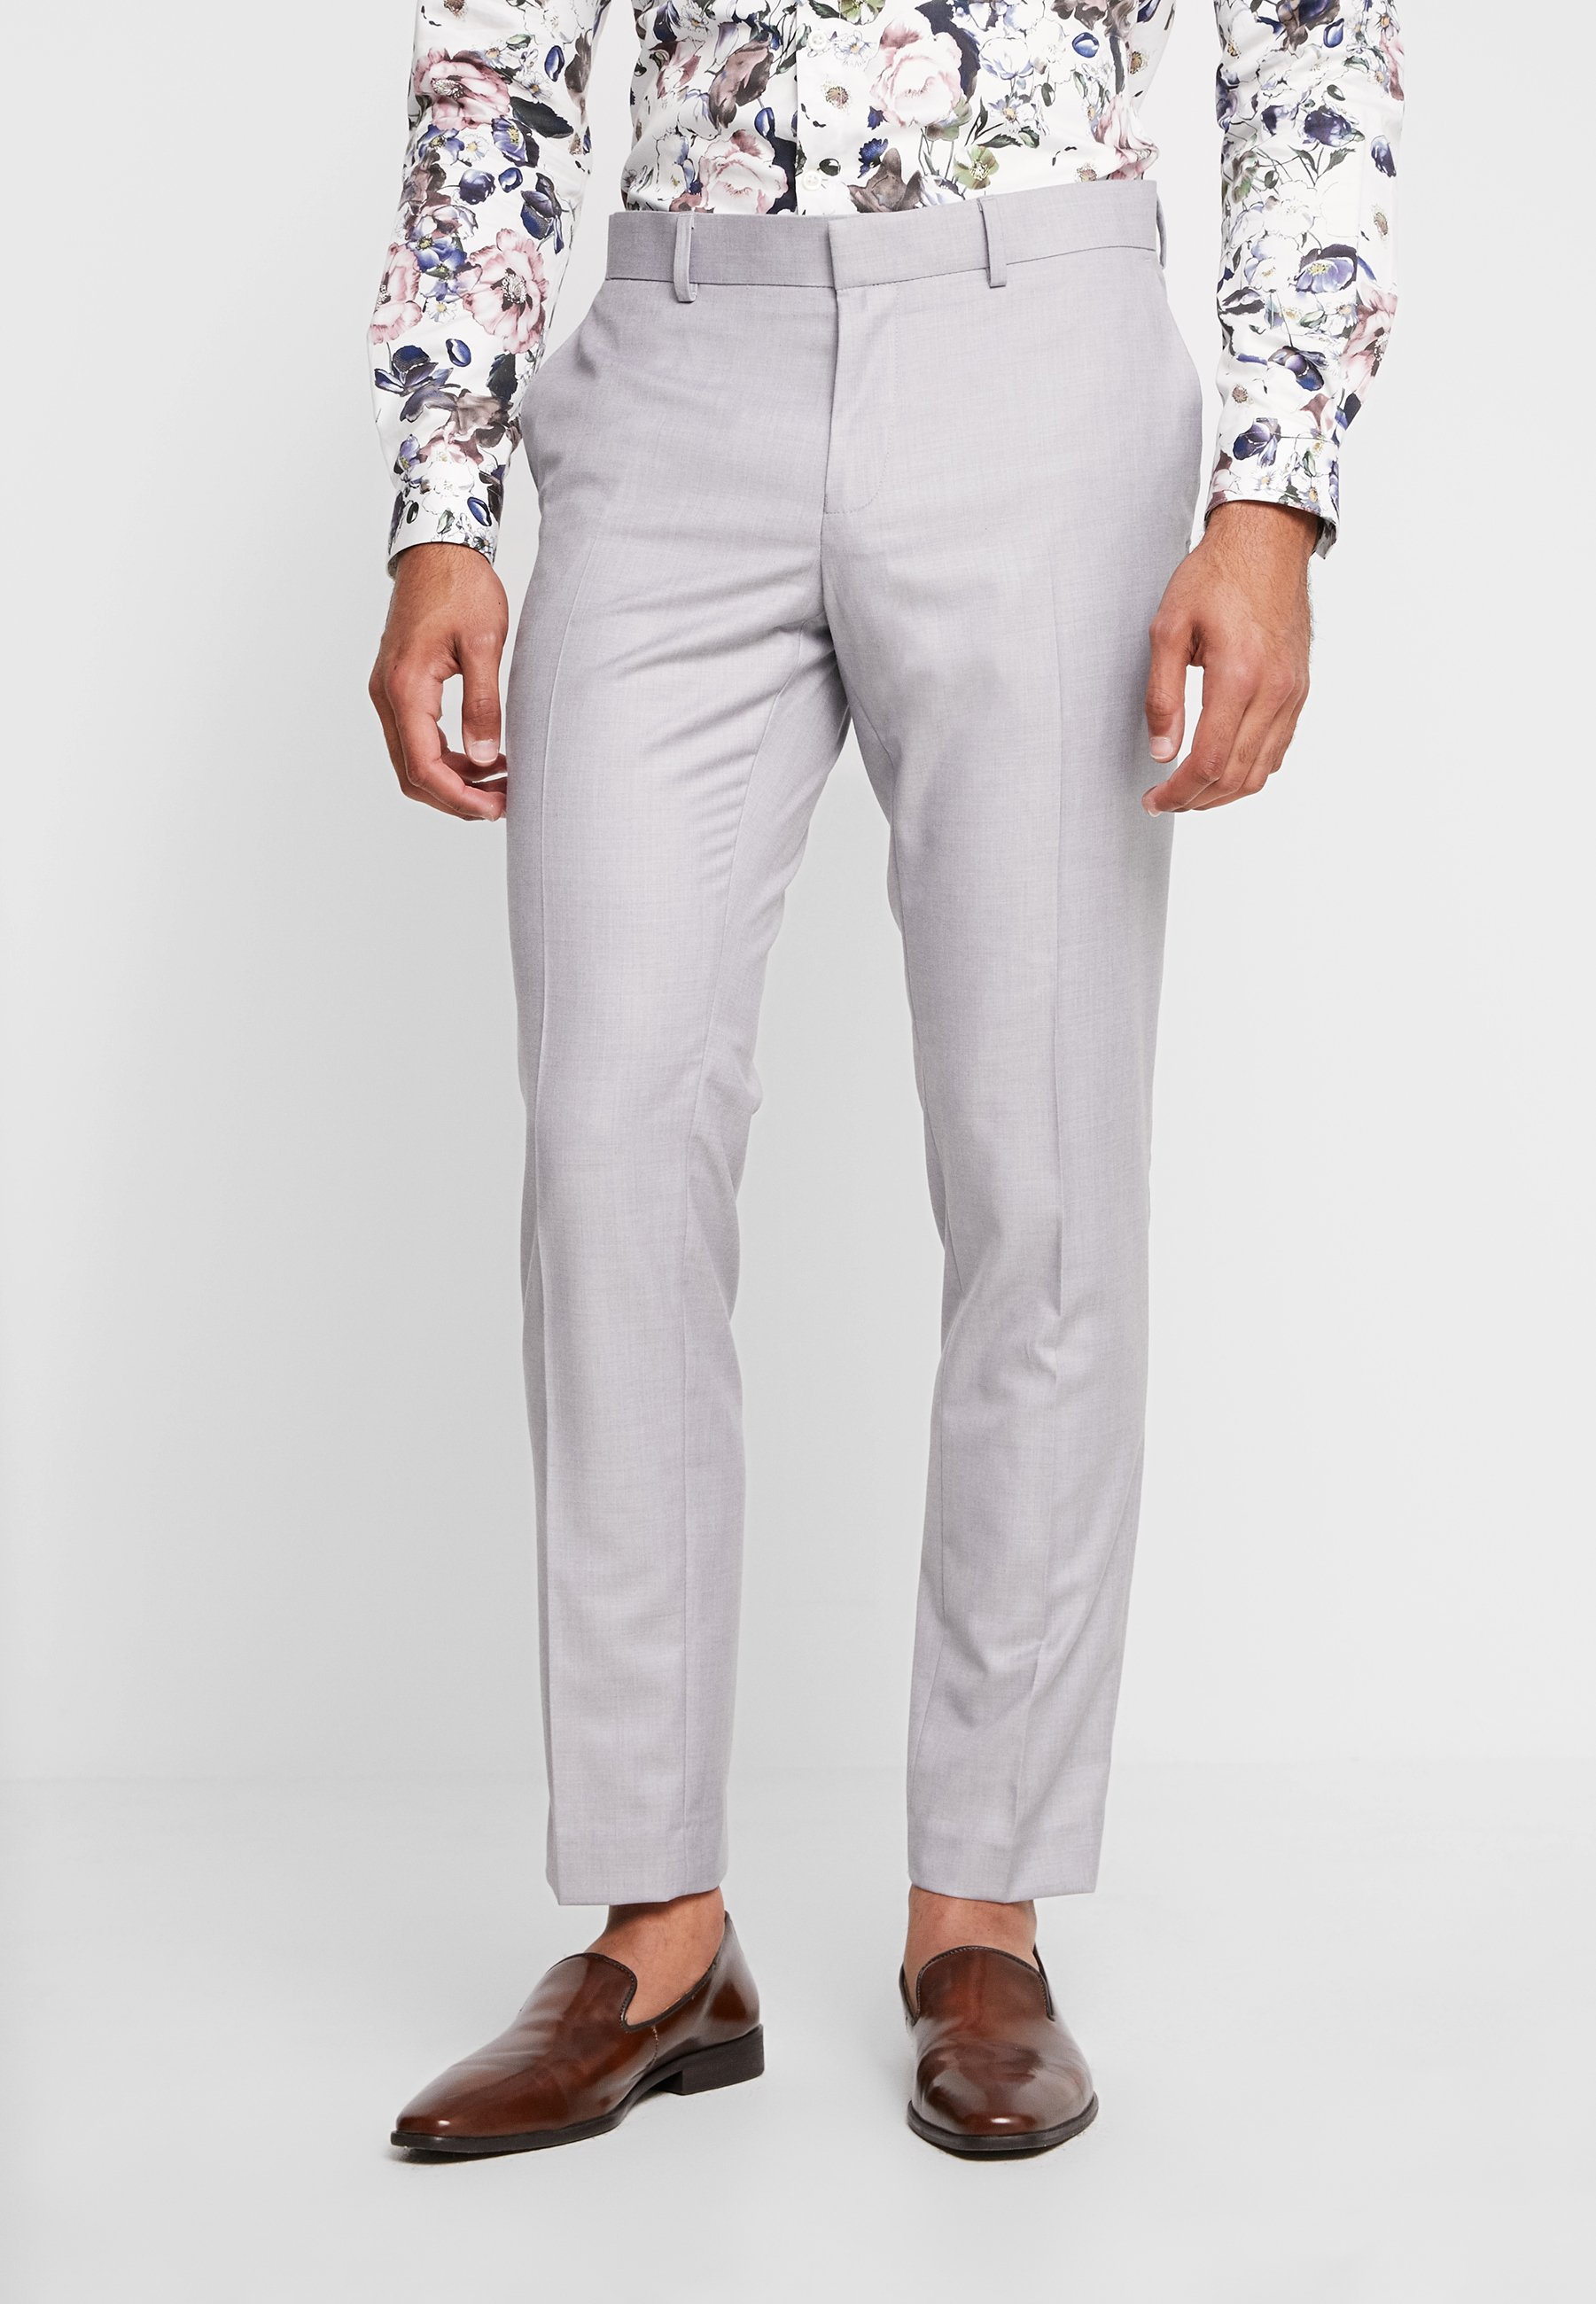 Dewhirst Light Isaac SuitCostume Grey Fashion qSzMVUp